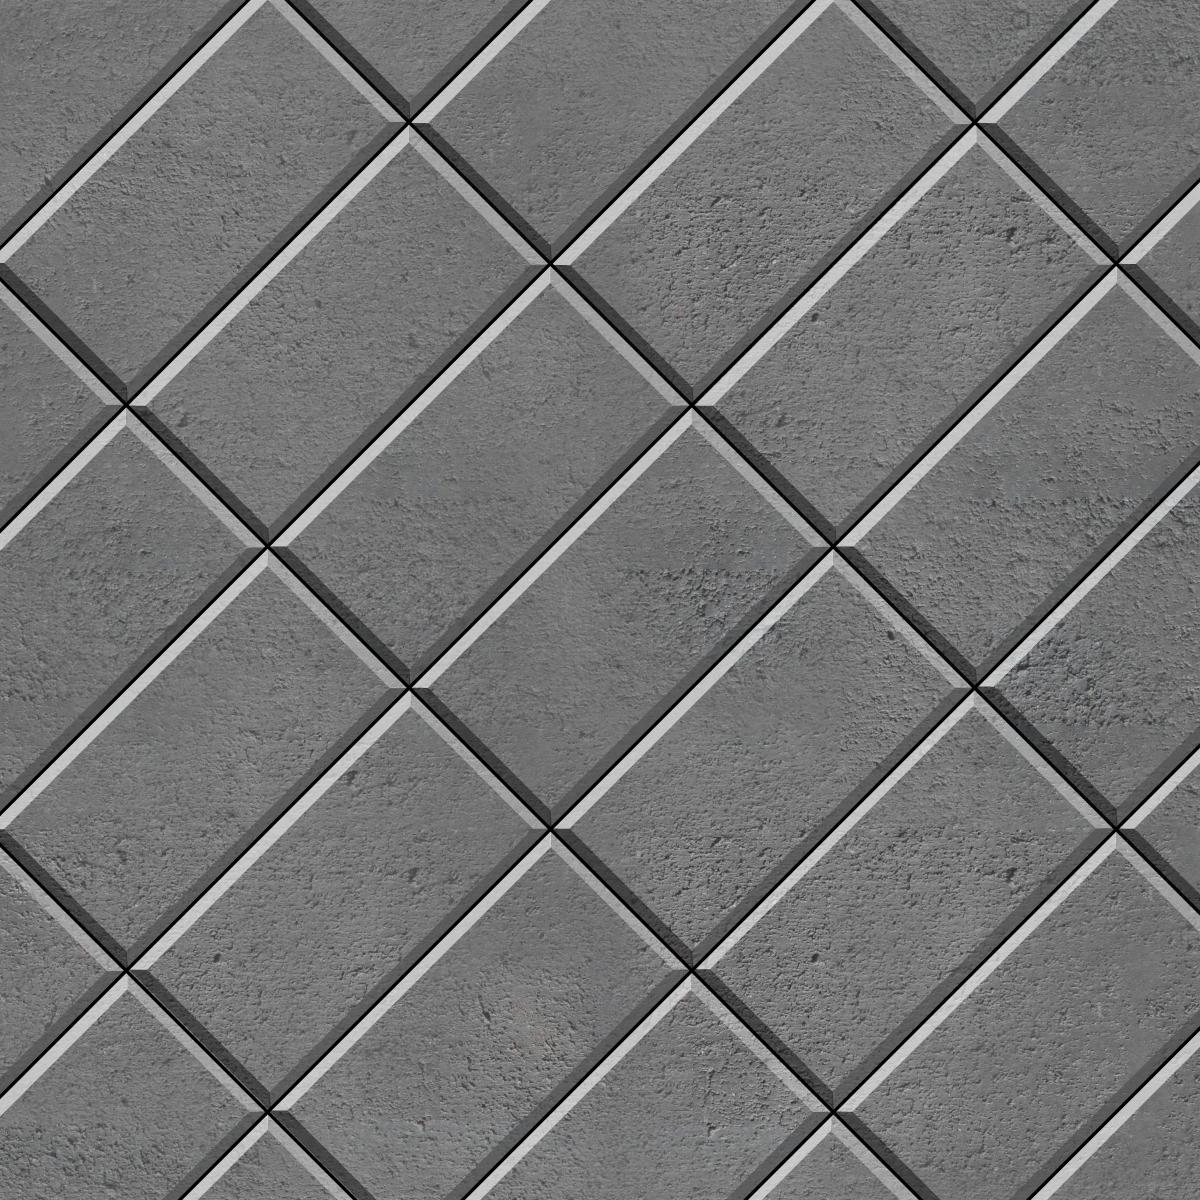 45 Stack Bond brick paver